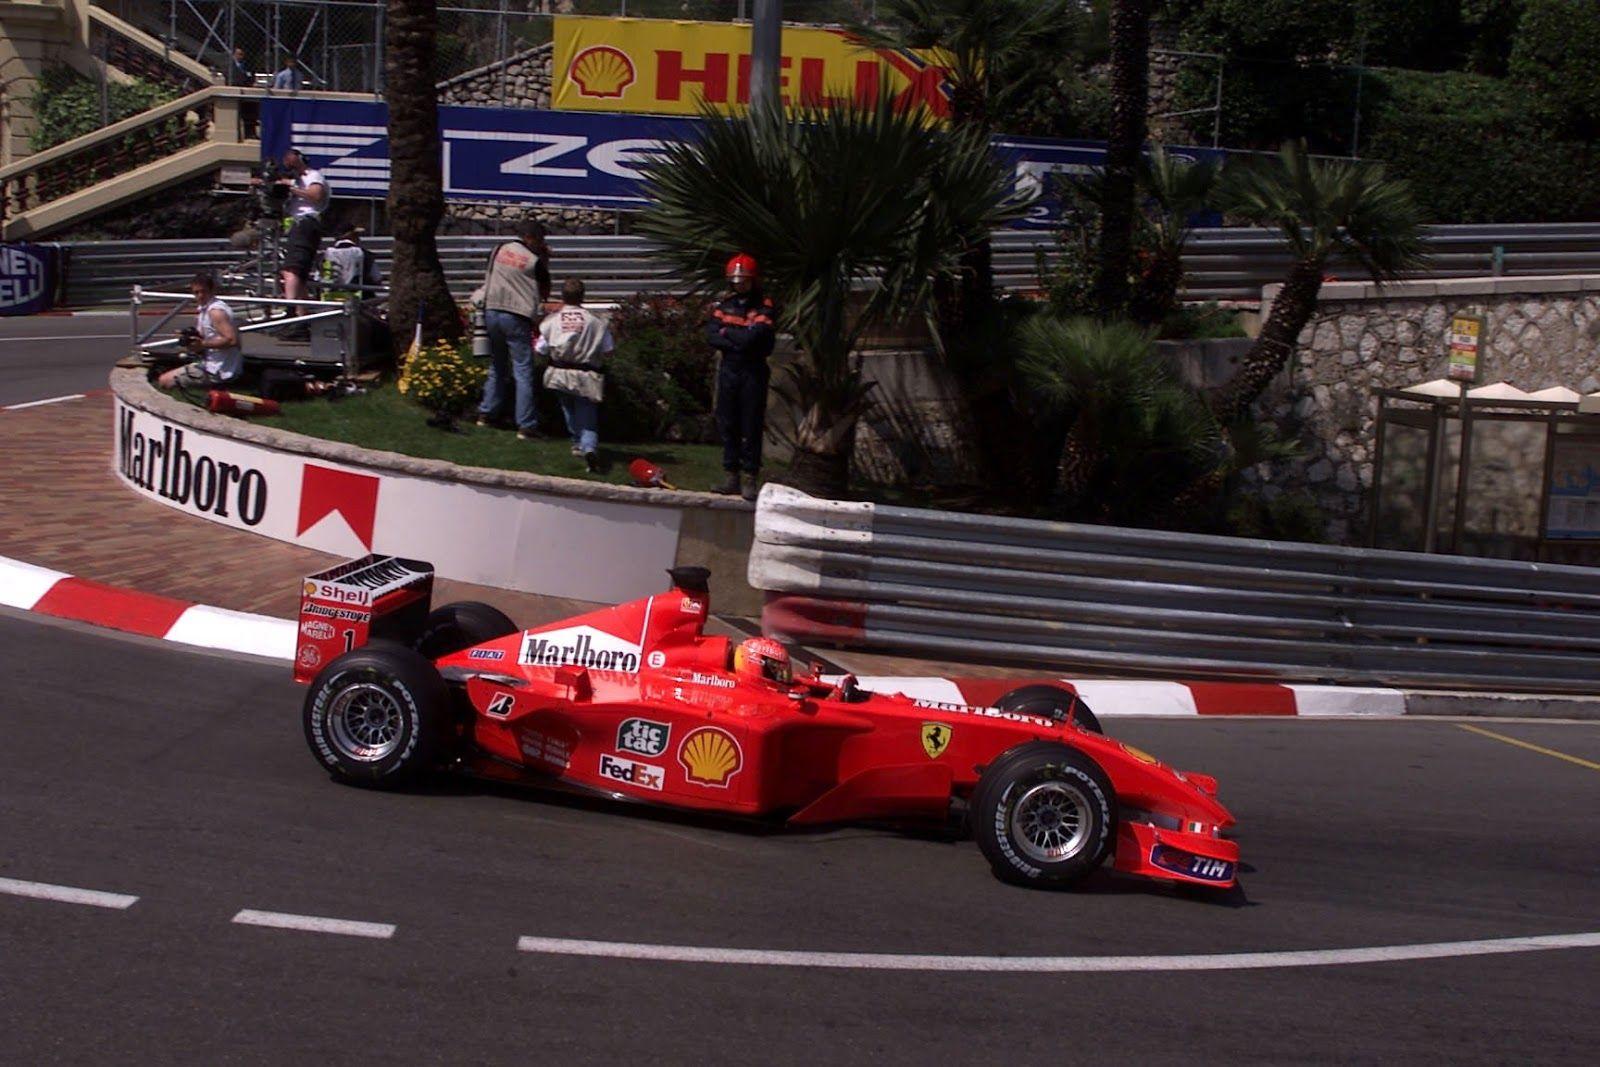 F1 FORMULA ONE LEGEND MICHAEL SCHUMACHER'S FINAL MONACO